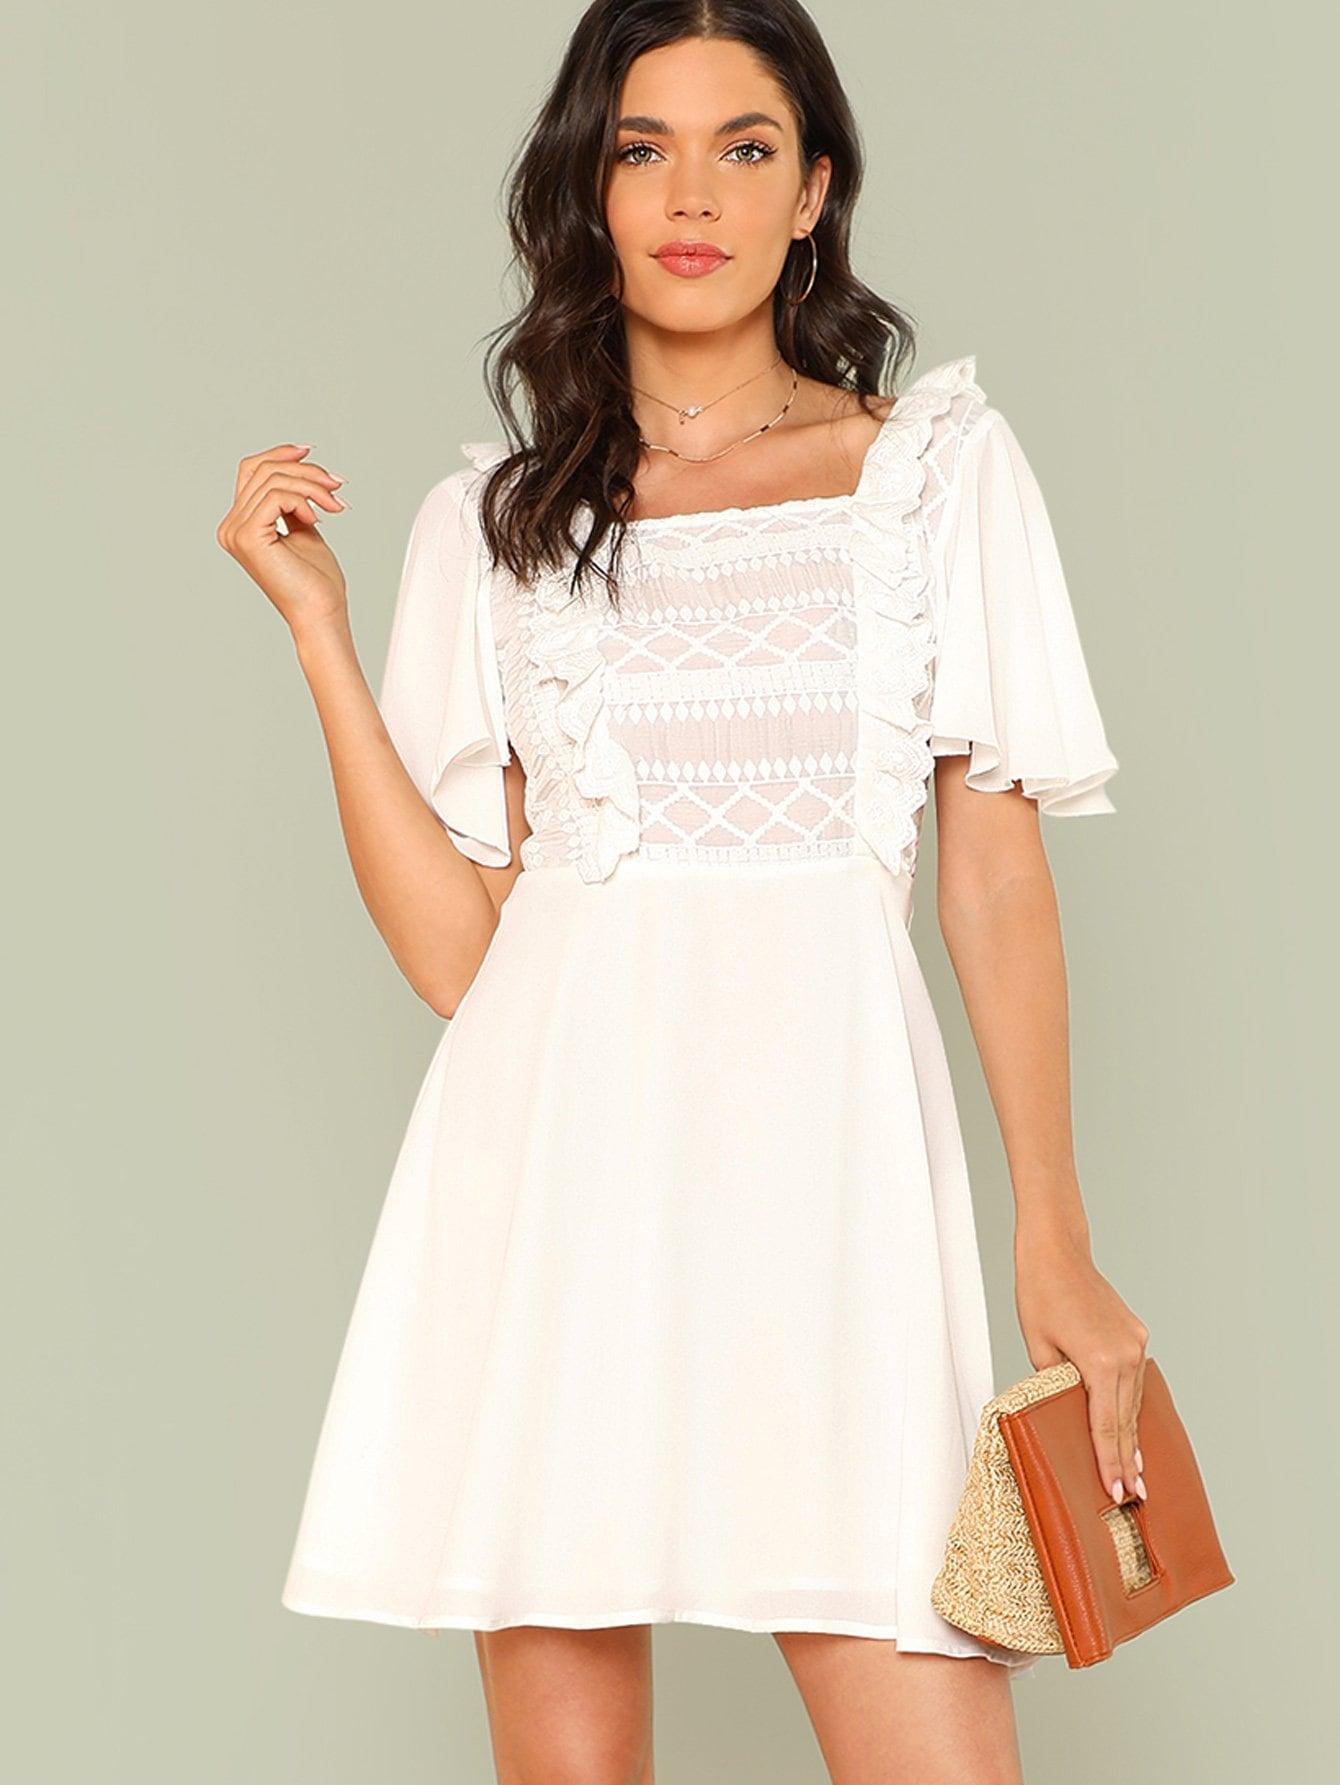 Ruffle Trim Solid Dress one side ruffle trim solid dress